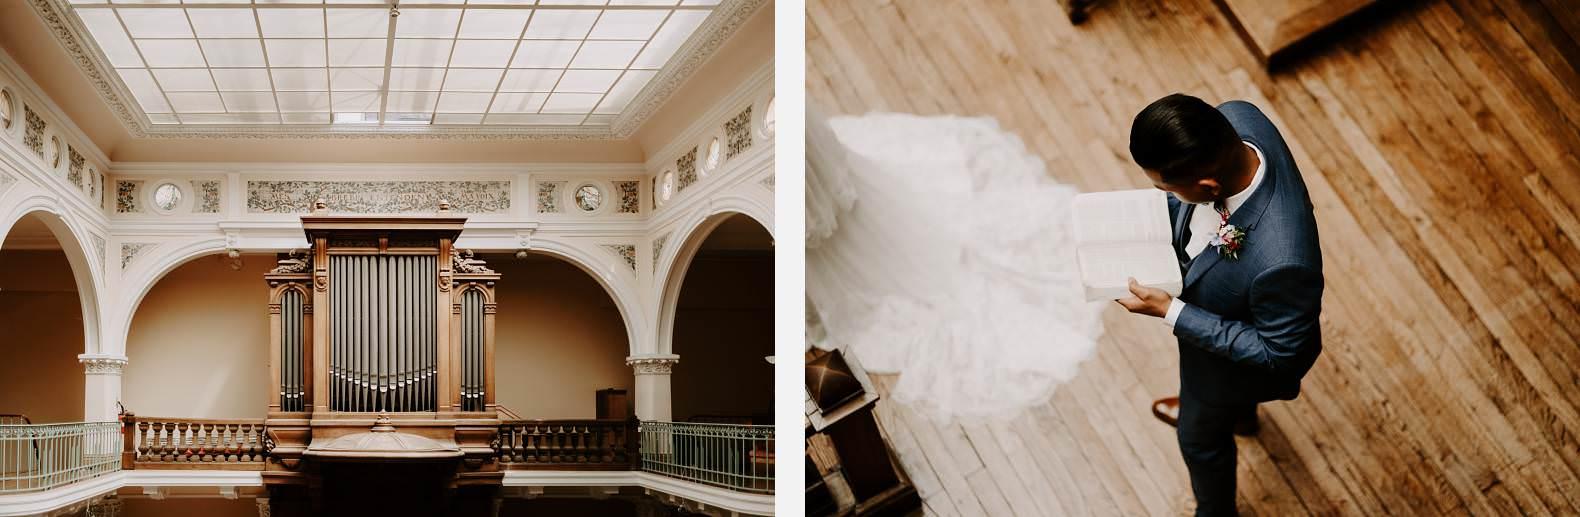 mariage manoir de corny photographe bel esprit 0021 1